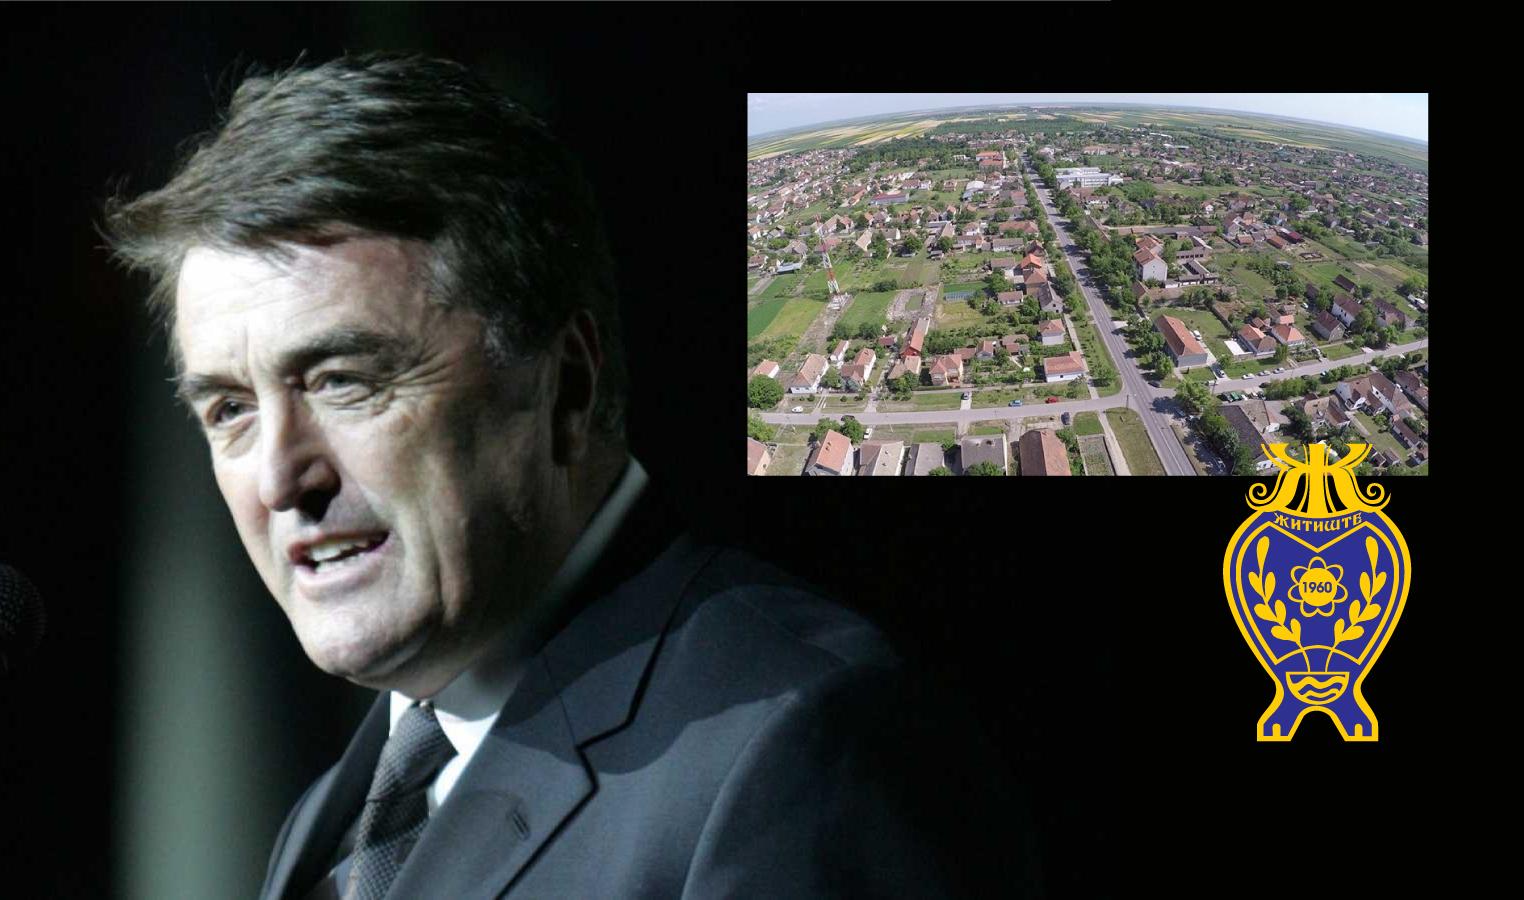 ANKETA: Da li po Radomiru Antiću treba da nazovemo stadion, trg, ulicu... u Žitištu?